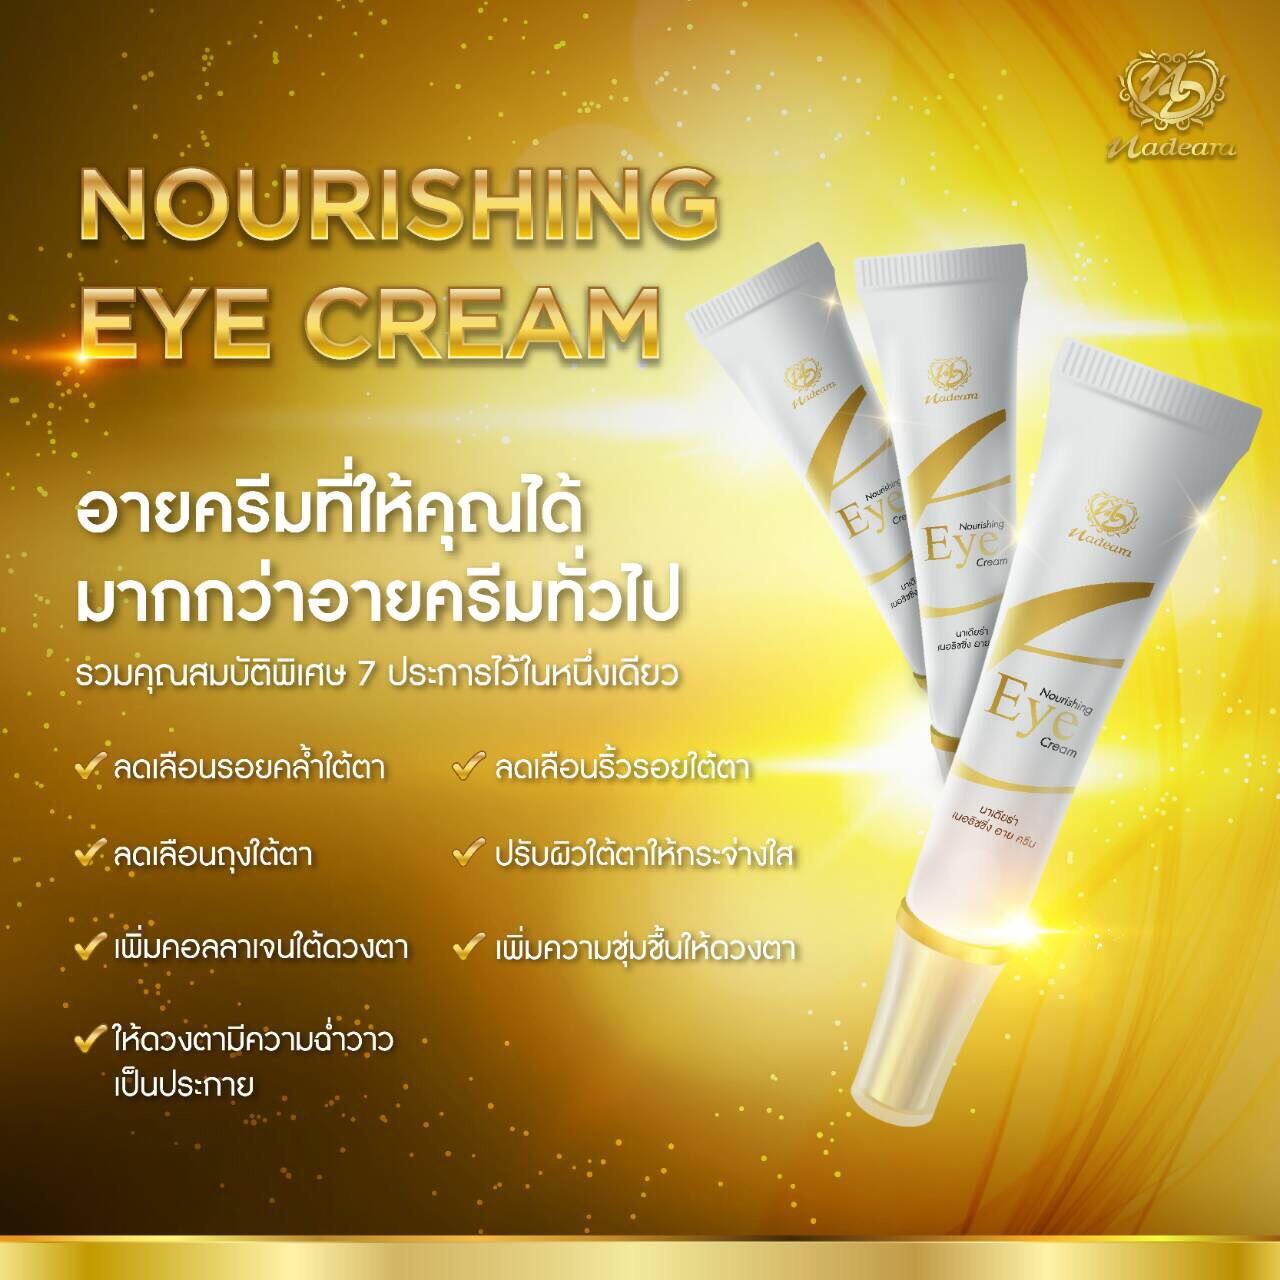 Nourishing Eye Cream ครีมบำรุงรอบดวงตา 7IN1